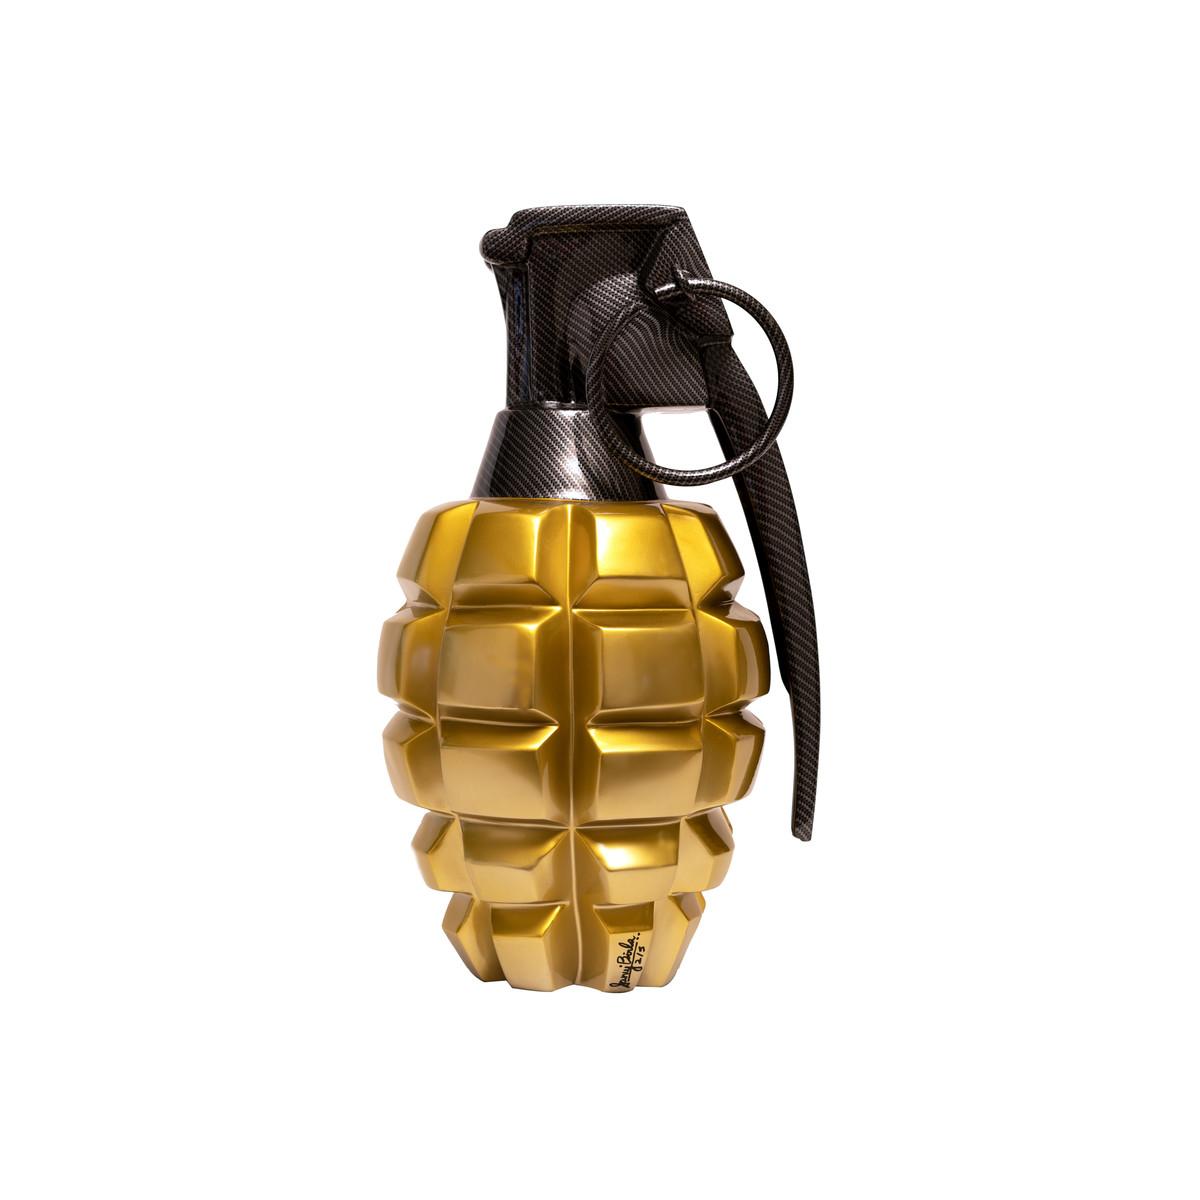 Pop Grenade gold/black by Sanuj Birla, Pop Art Sculpture | 3D, Fiber Glass, White color